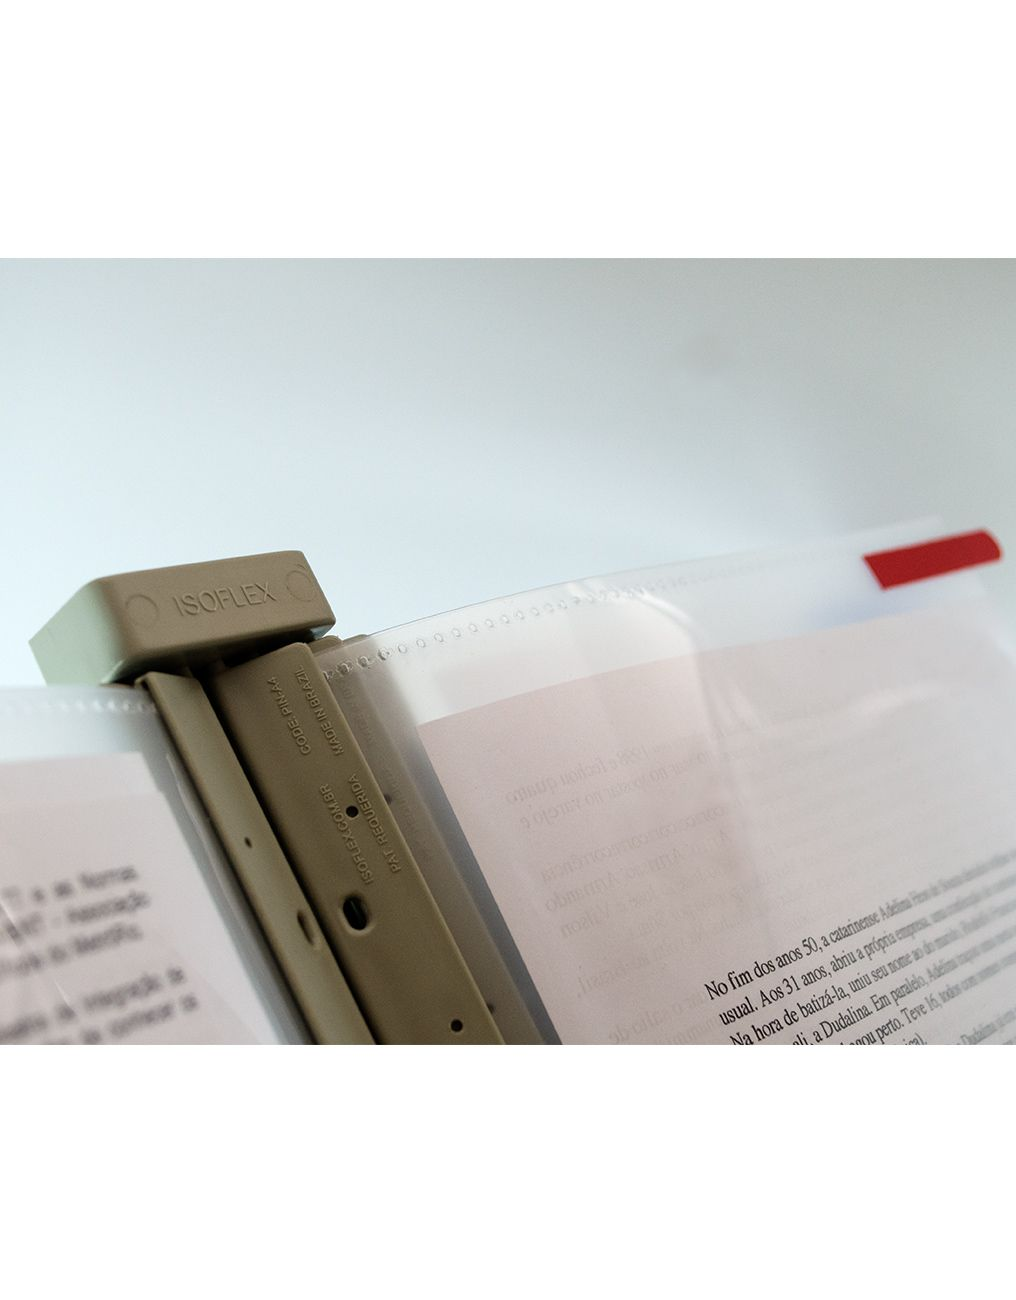 Combo Promocional 1 - 5 pastas Inova + 1 Suporte SIP1-005 + Kit com 5 Identificadores de Piso